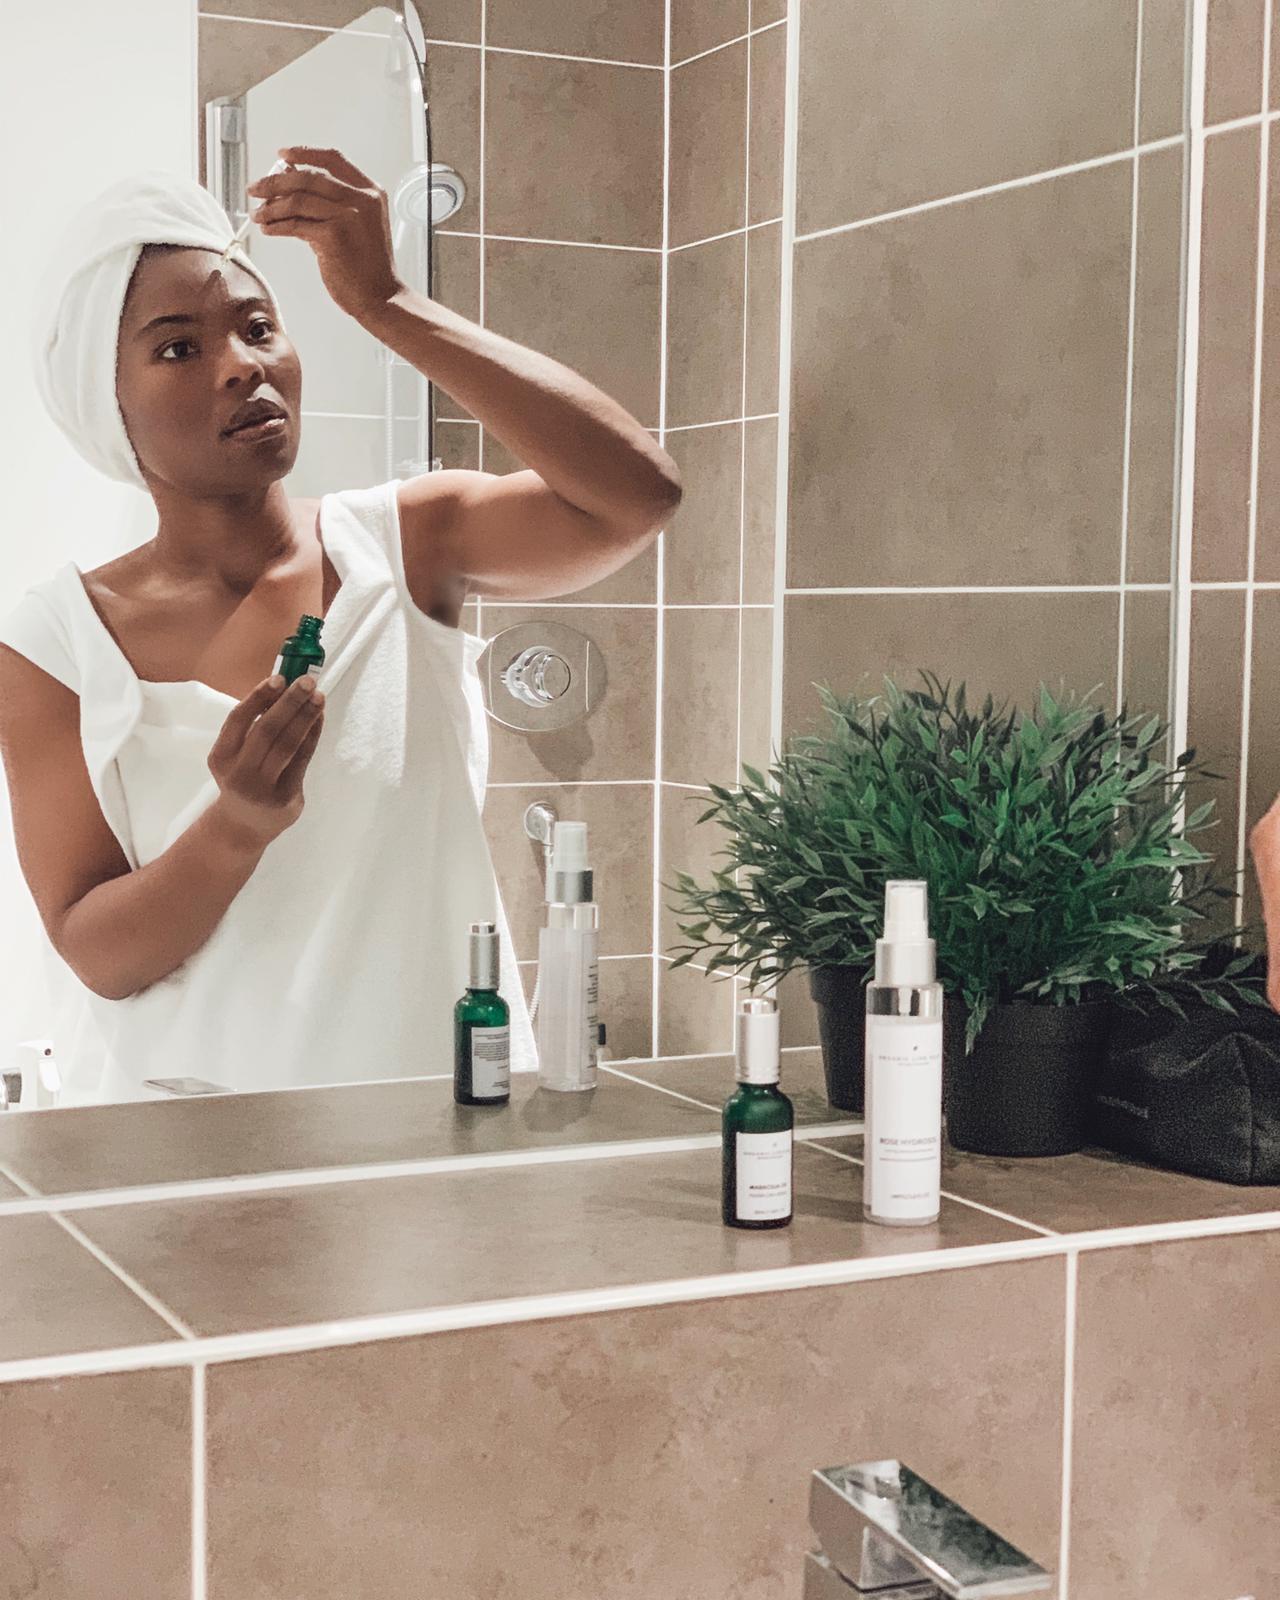 My Skincare Routine Featuring Organic Life Plus Rose Hydrosol & Serums